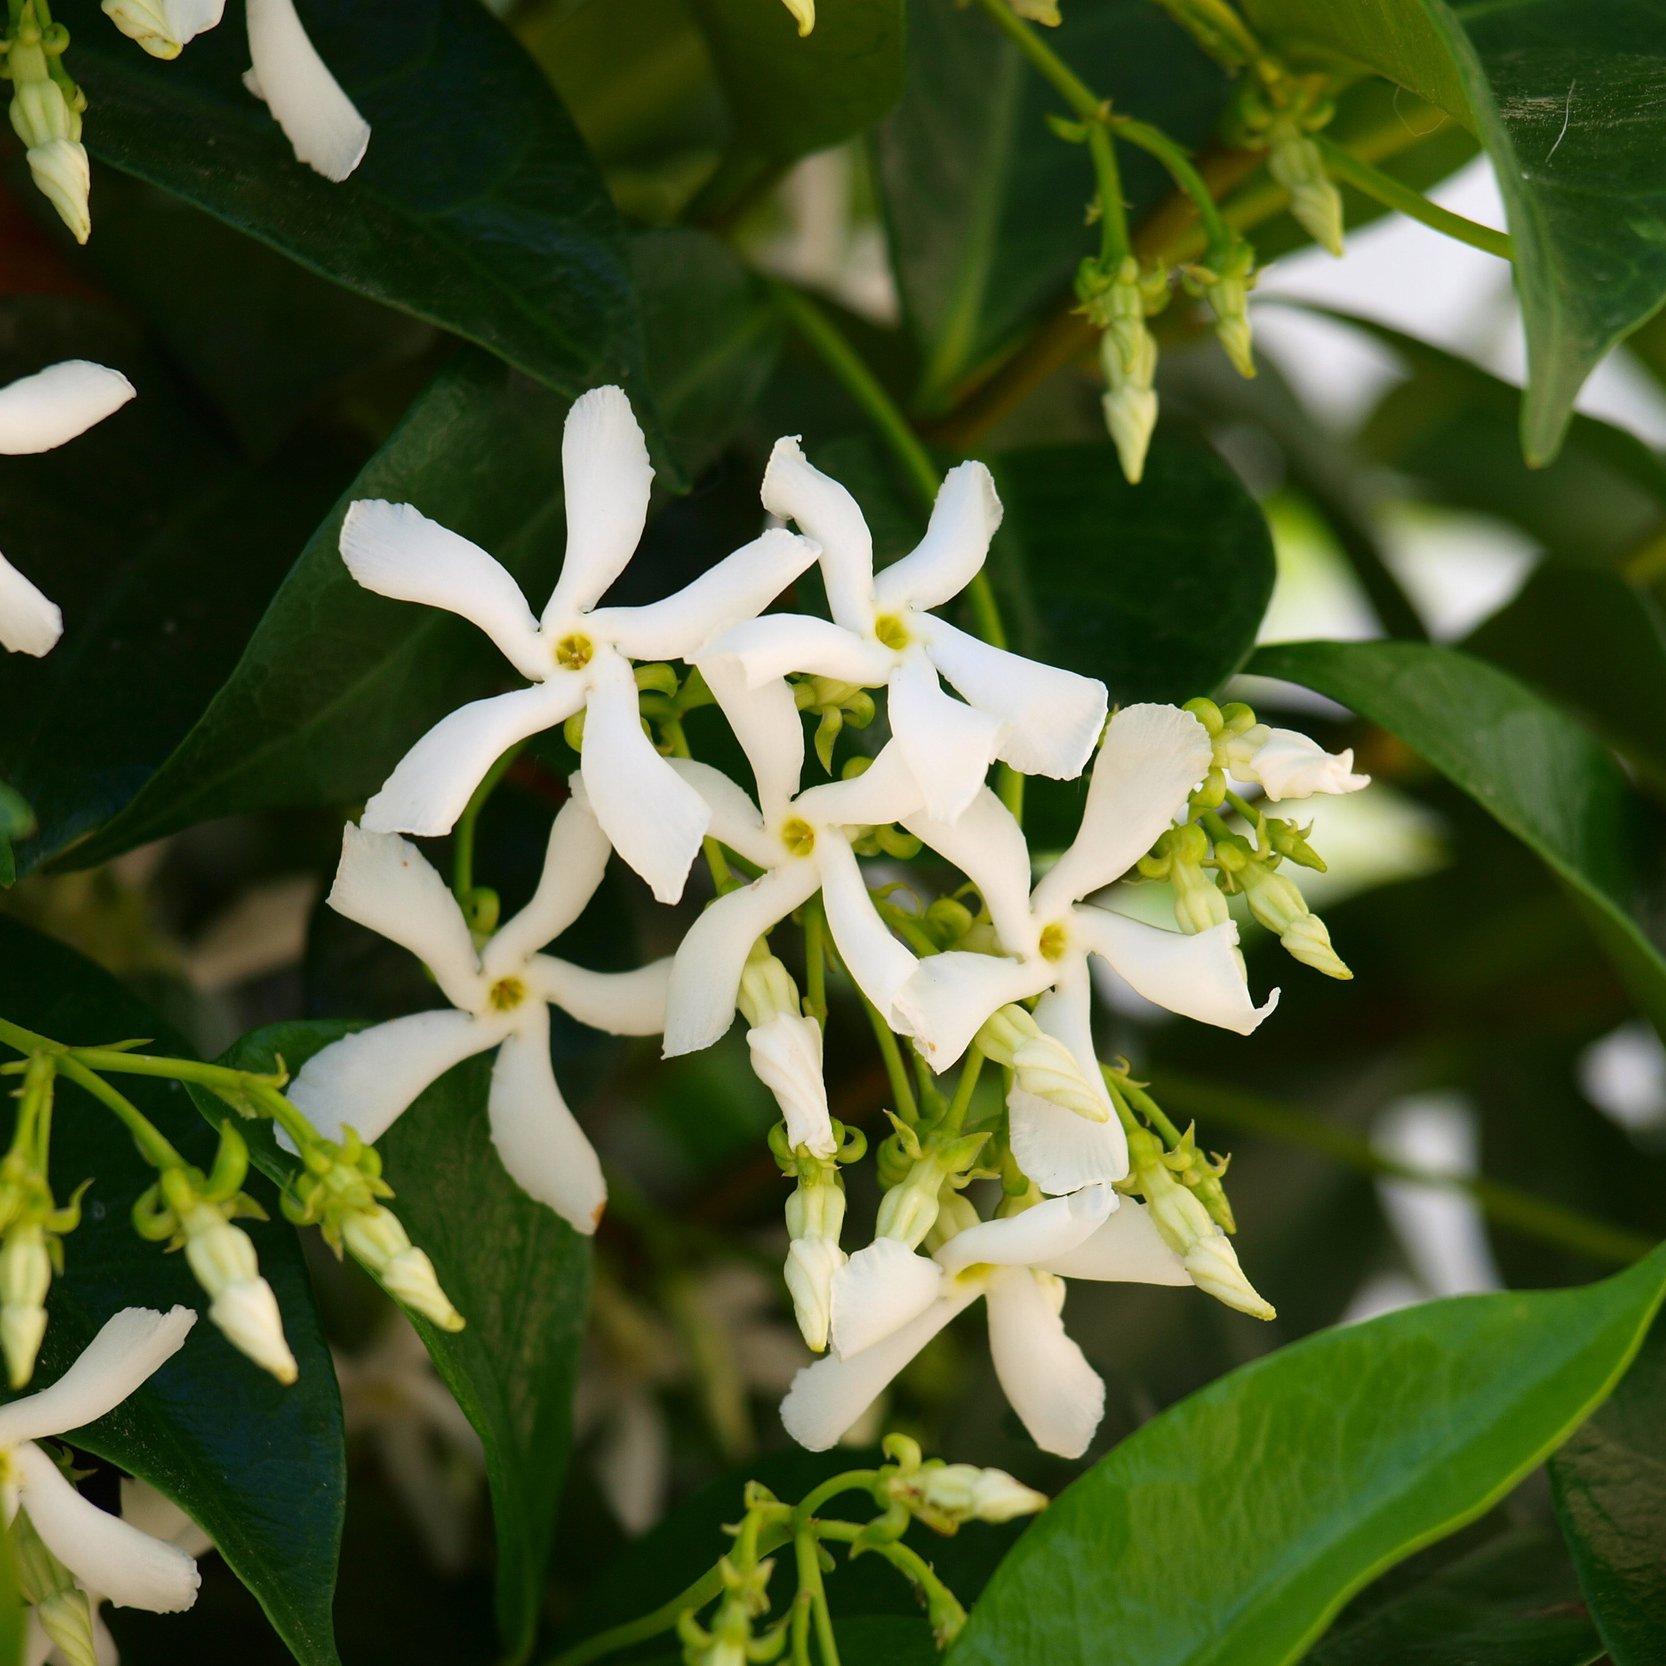 Trachelospermum Jasminoides Evergreen Star Jasmine Climbing Plant 1